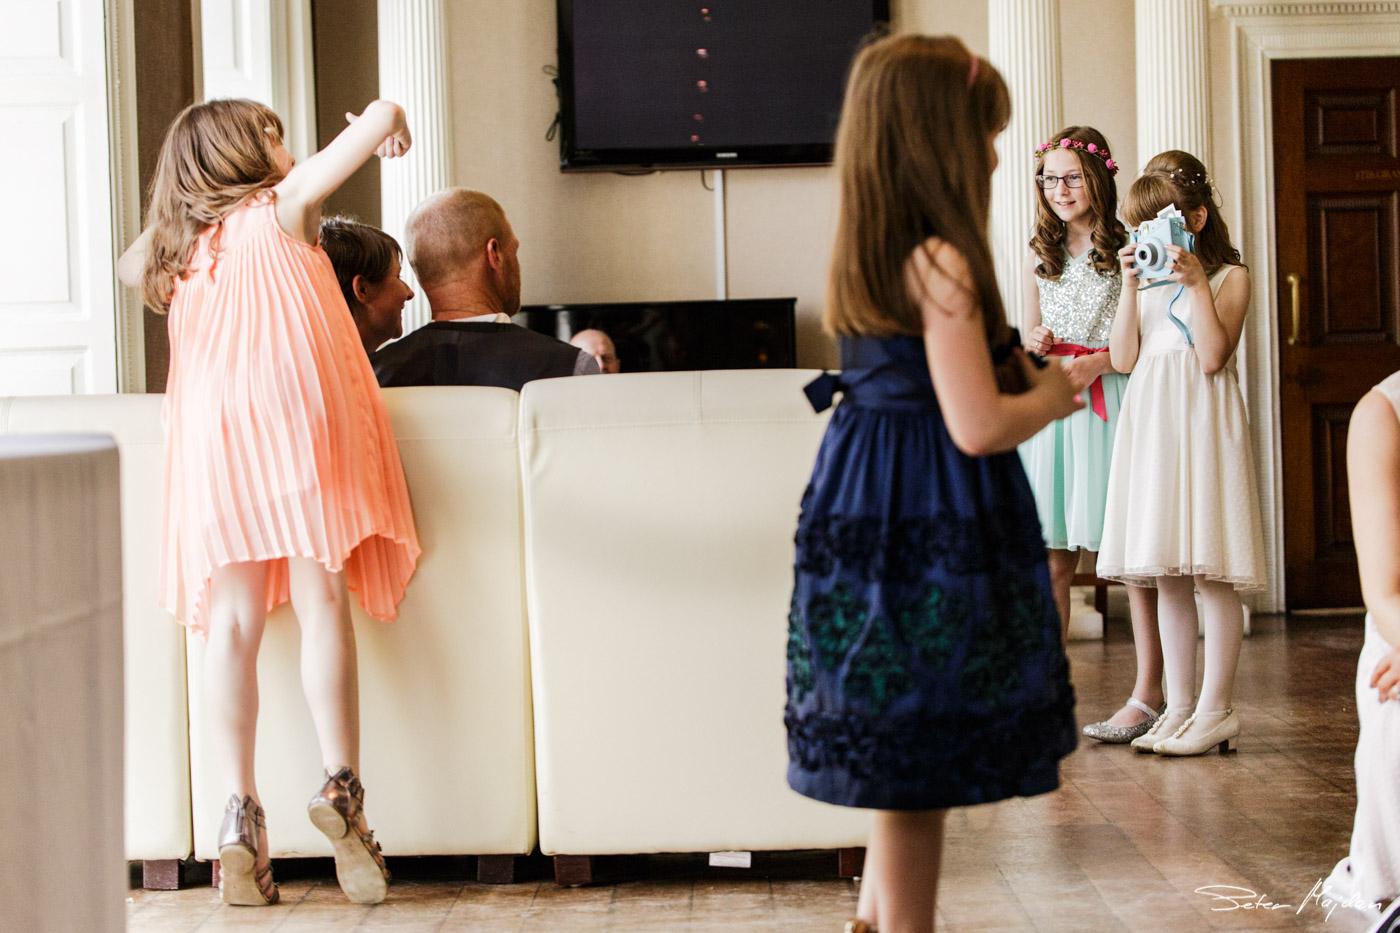 Colwick-hall-wedding-photography-38.jpg